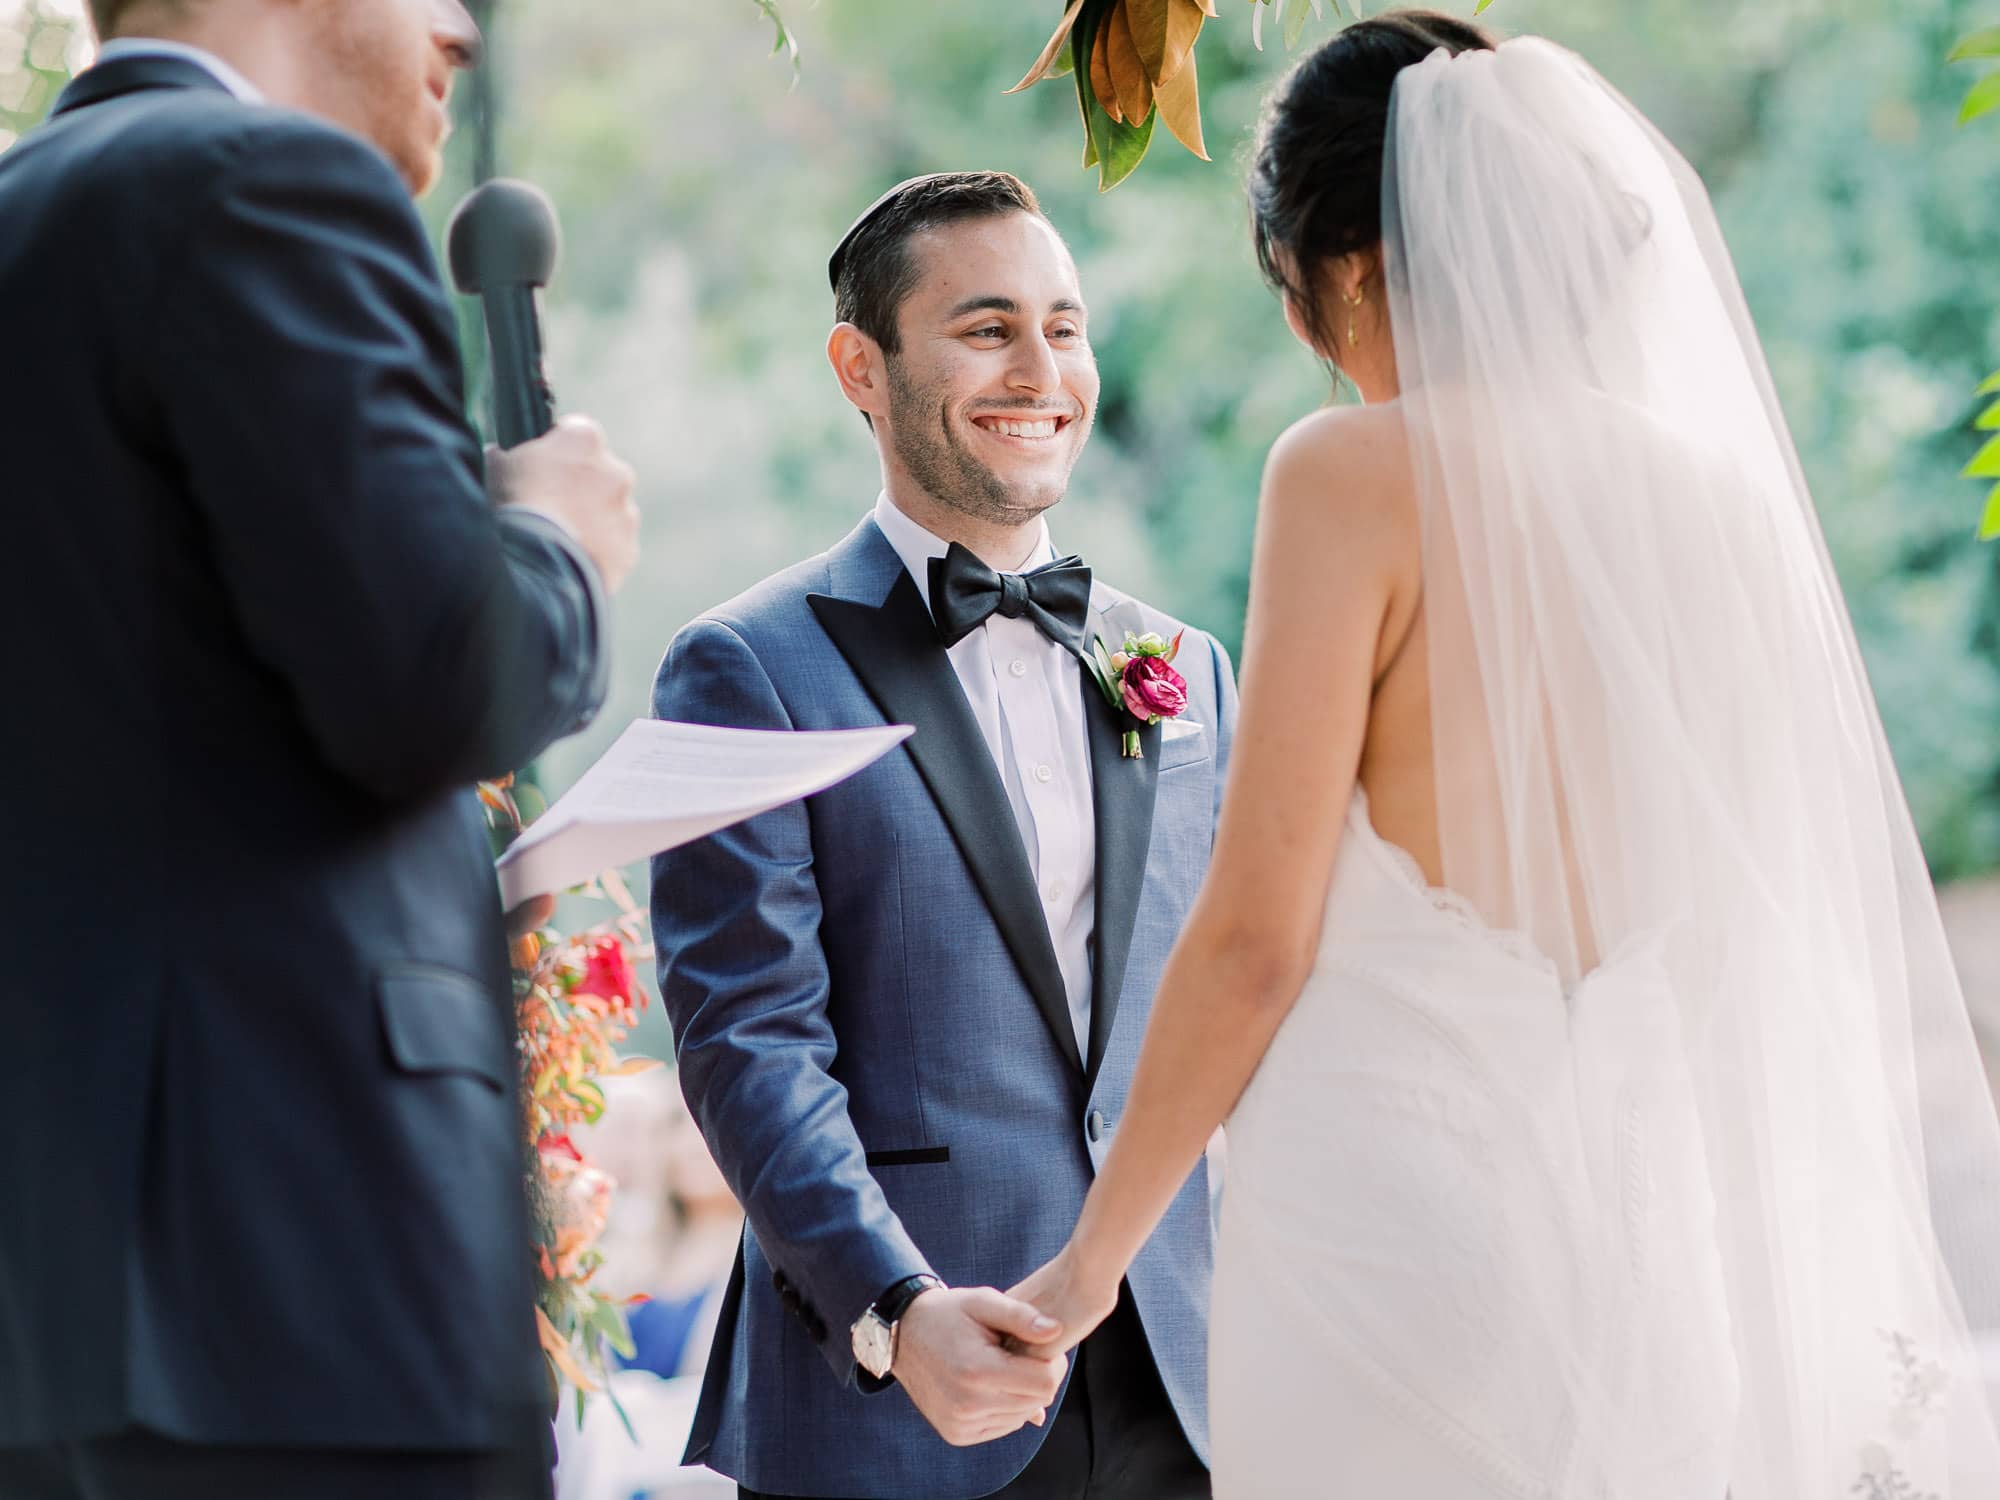 Wedding-Ceremony-Inspiration-Photo-Greg-Ross